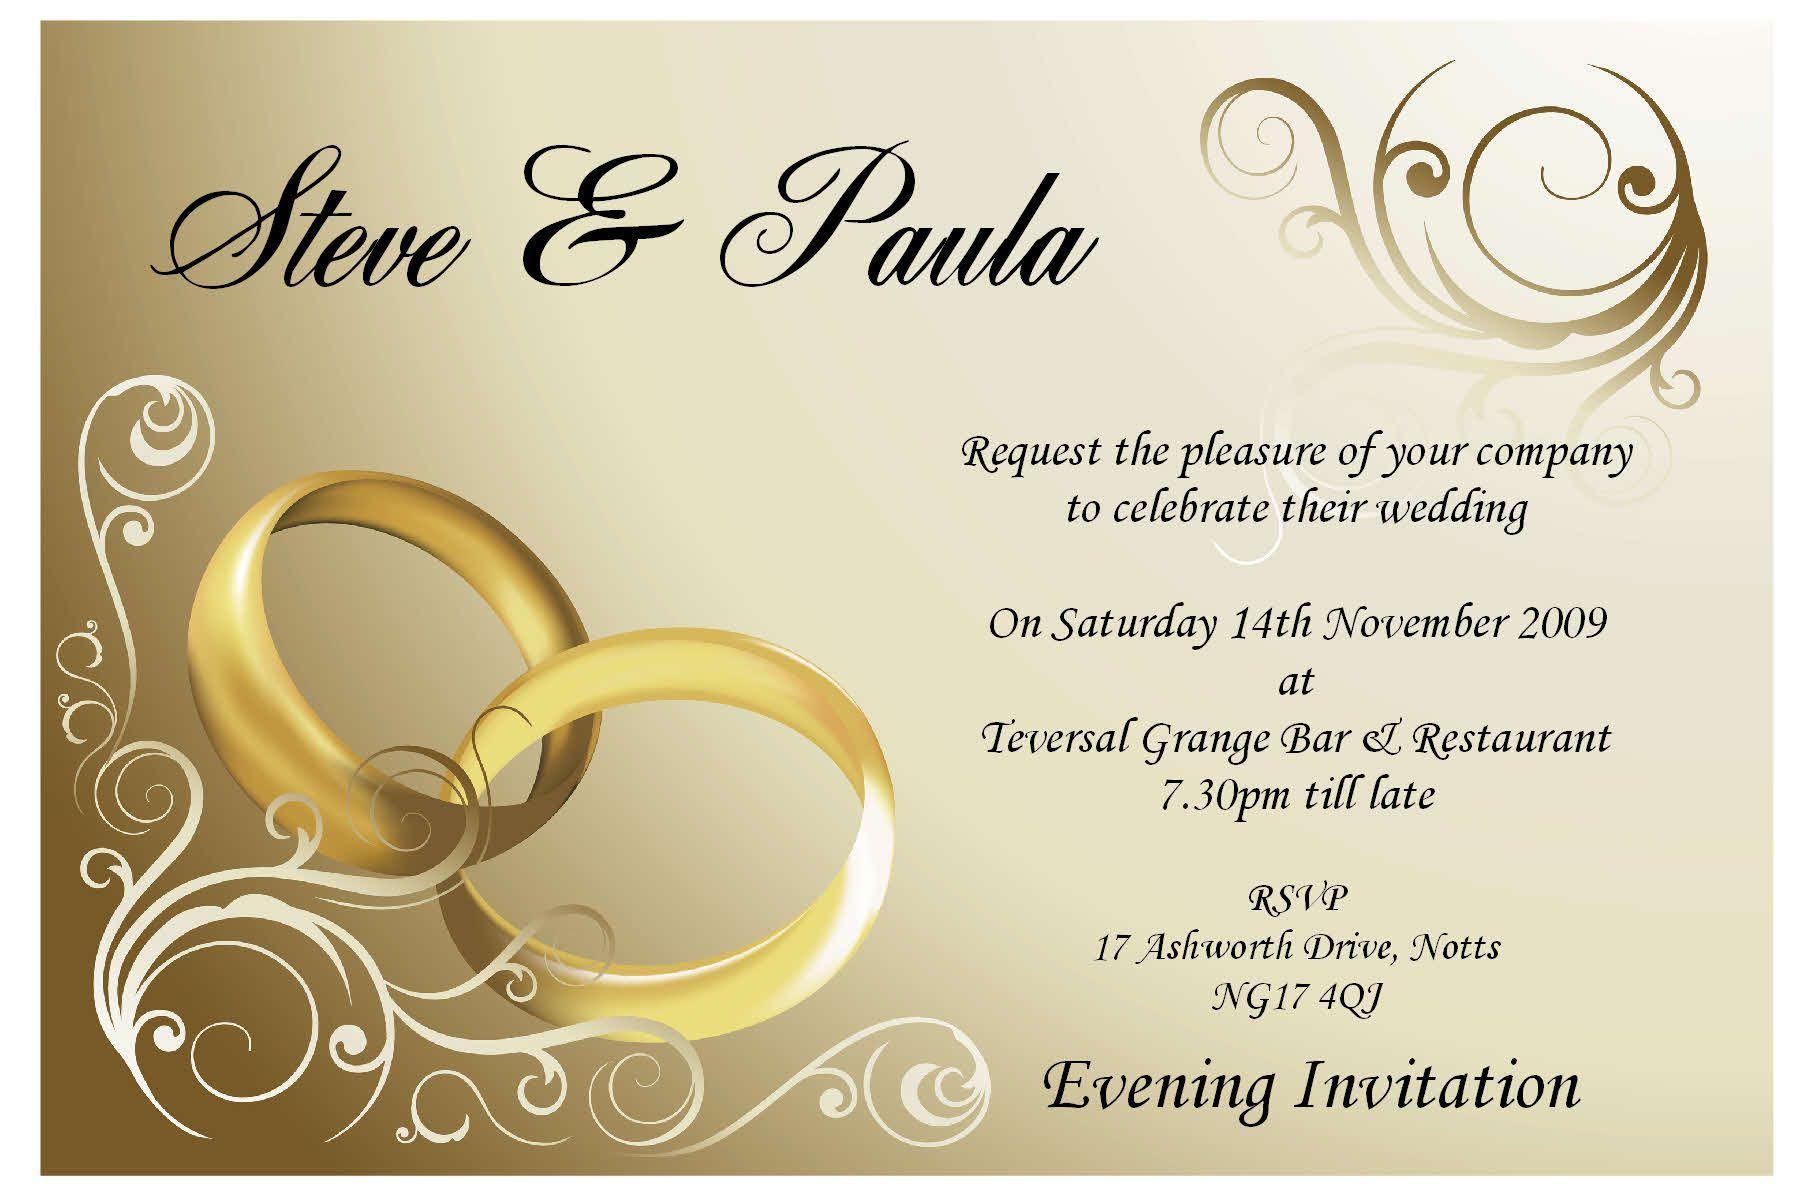 001 Formidable Sample Wedding Invitation Card Template High Resolution  Templates Free Design Response WordingFull